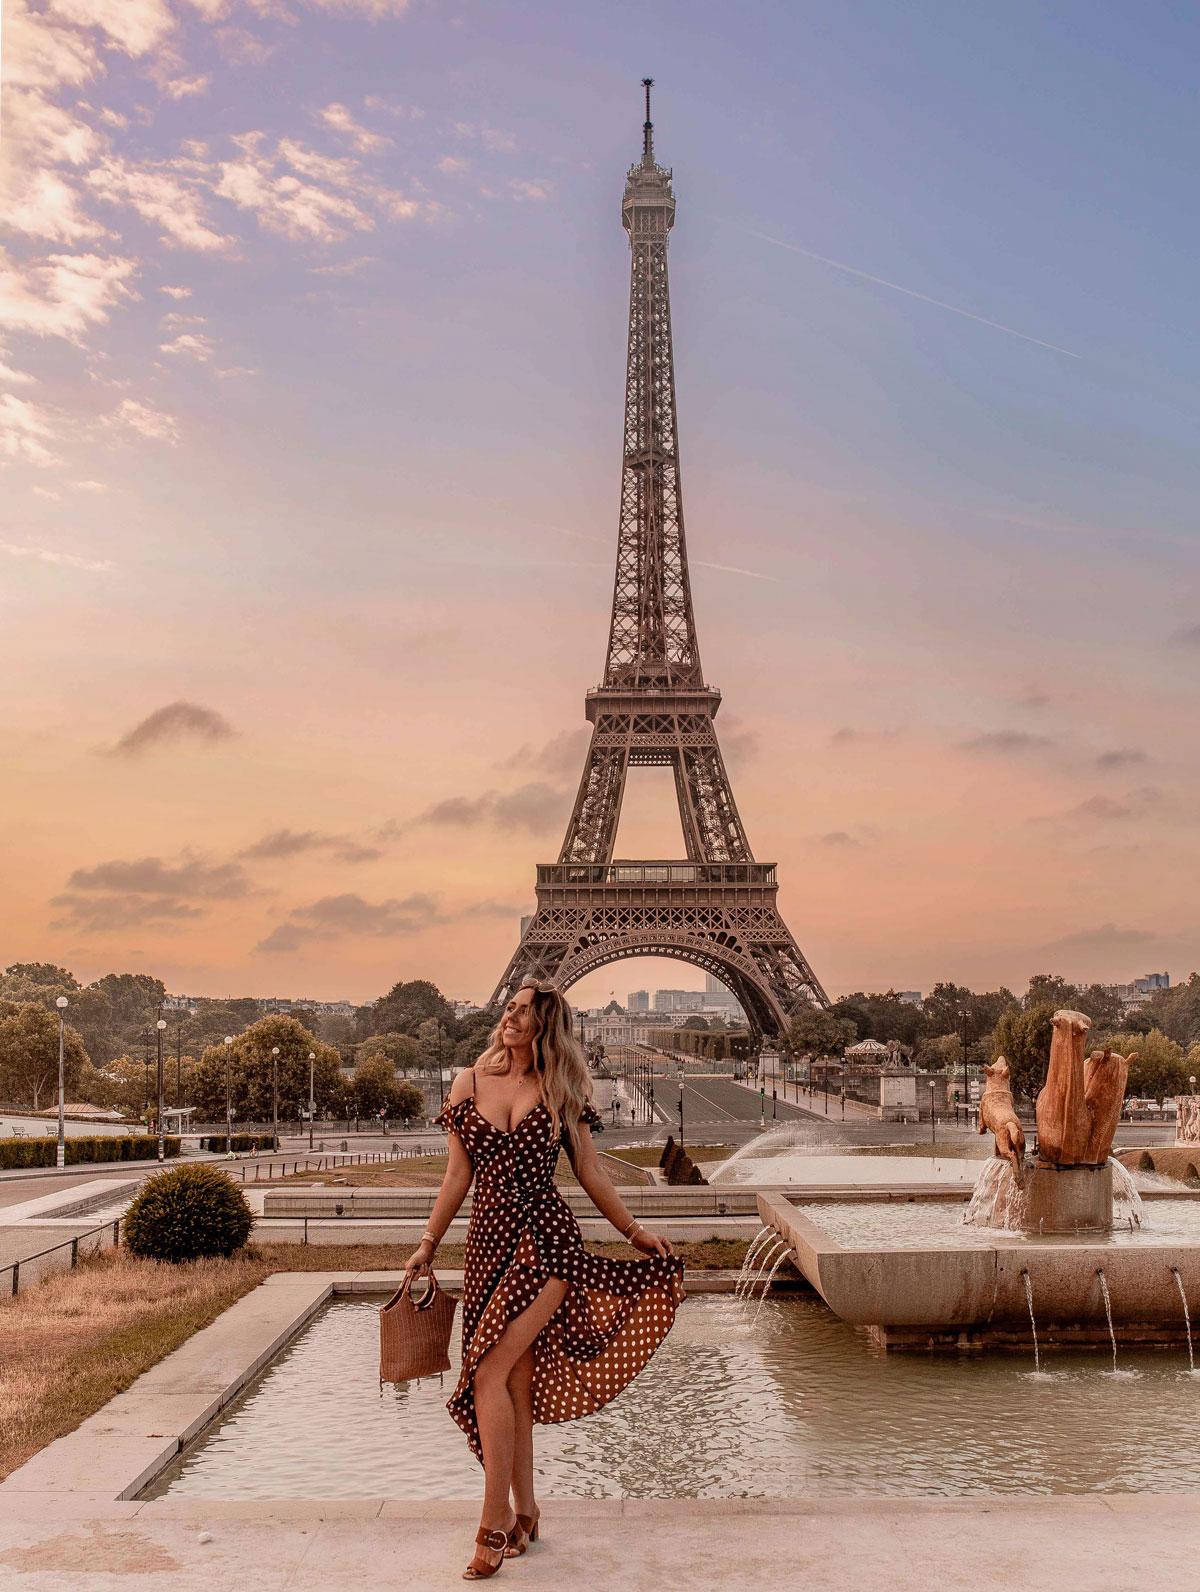 Paris Instagrammable 1-kelseyinlondon_kelsey_heinrichs_Paris--The-20-Best-Instagram-&-Photography-Locations